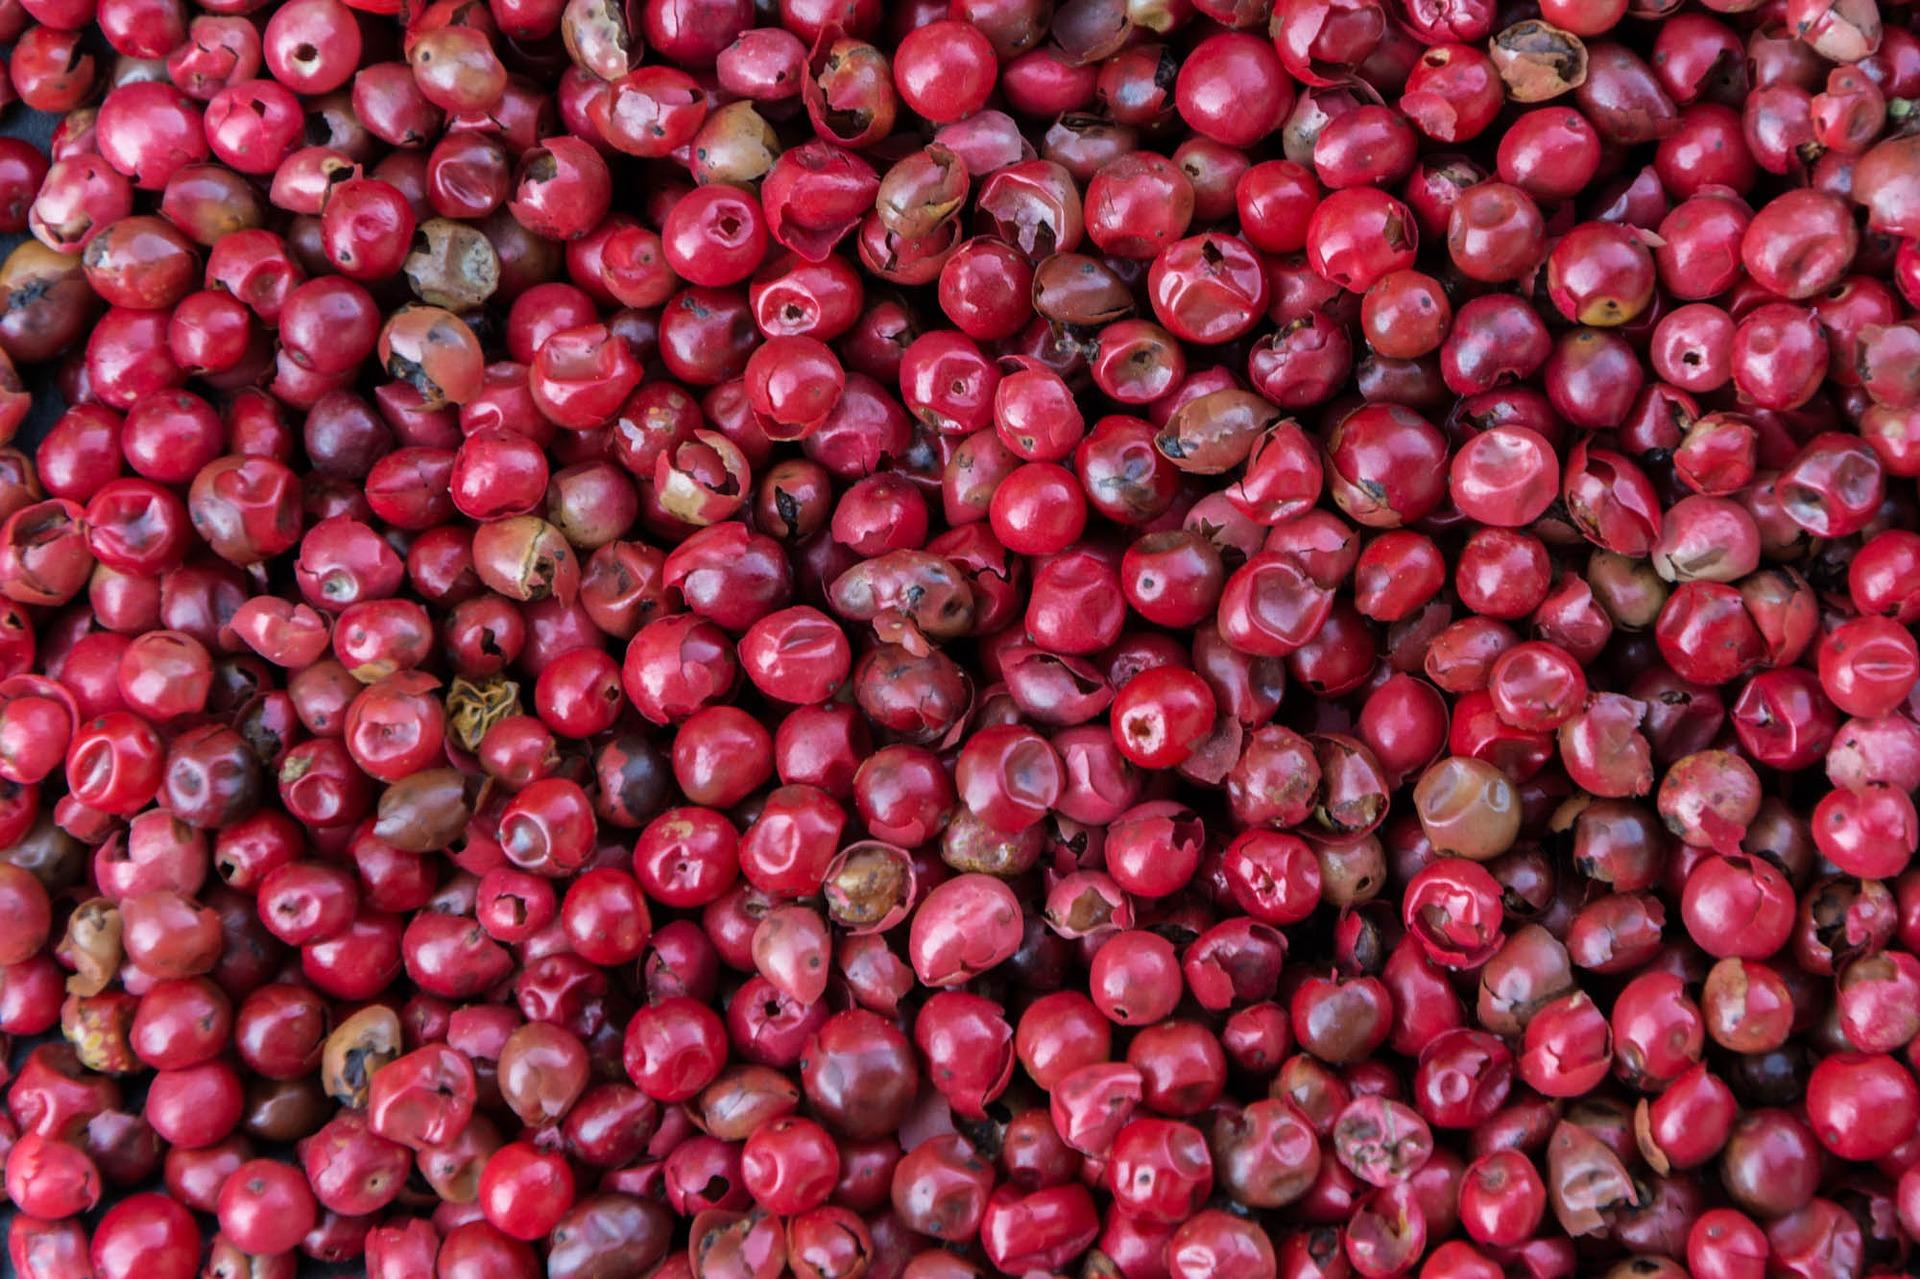 Rosa Beeren Schinus Terebinthifolius milder Pfeffer 20g